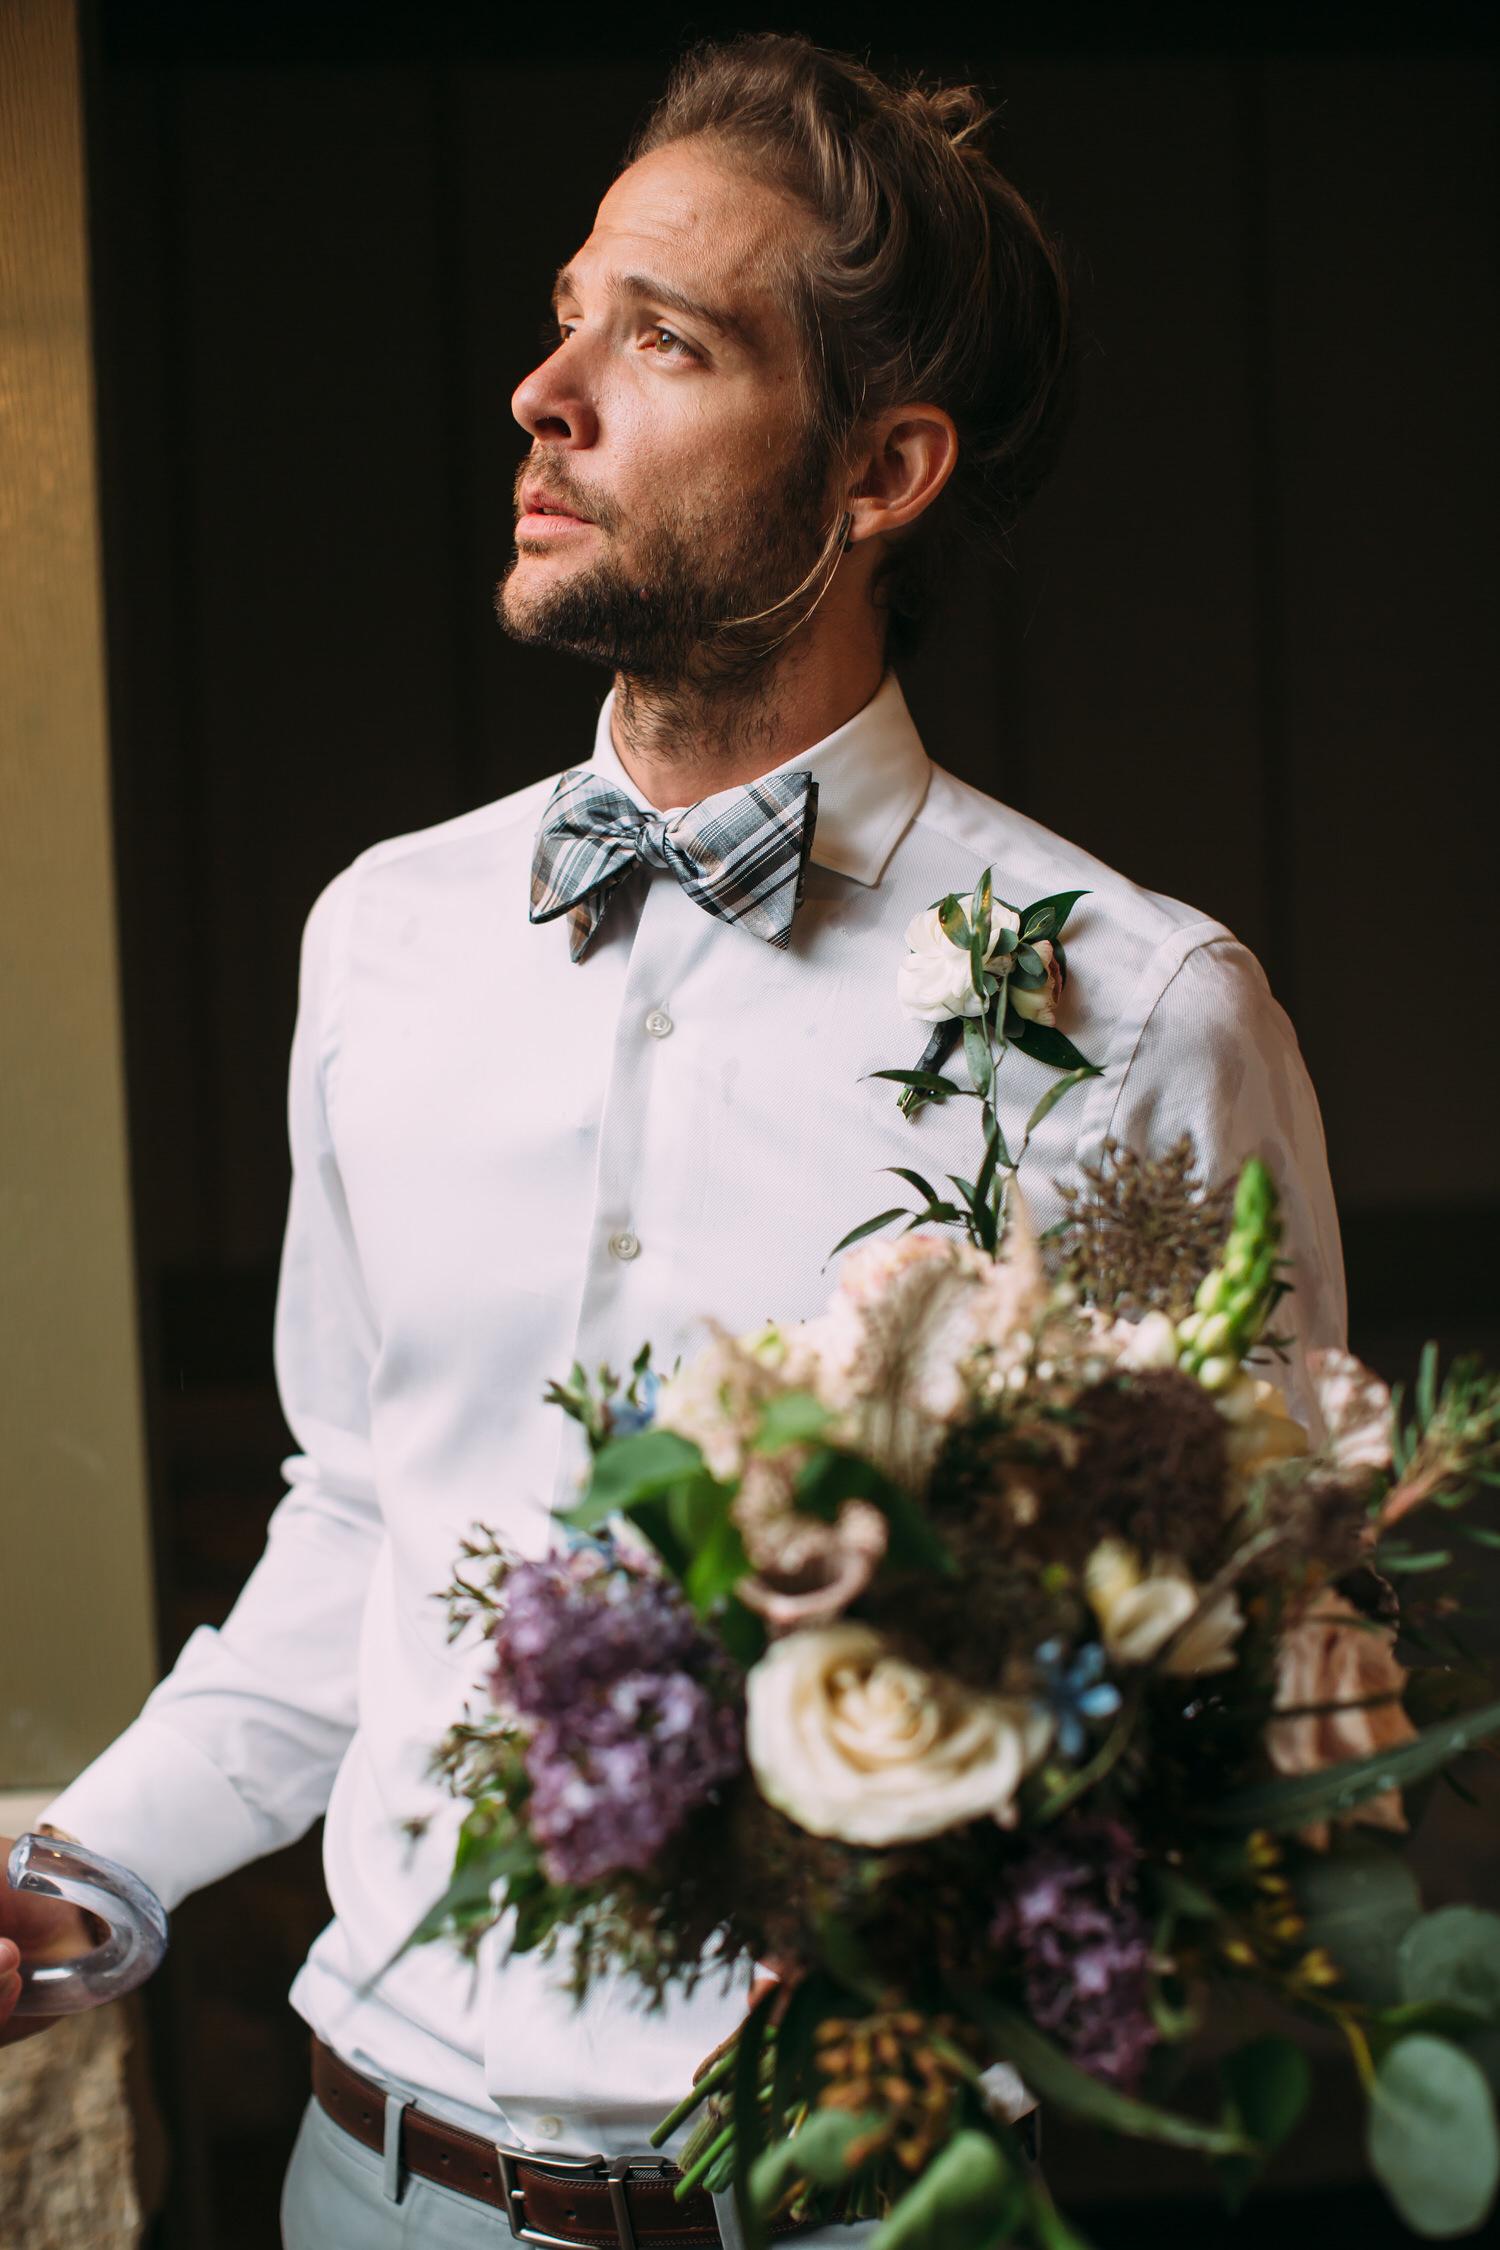 groom with man bun and wedding bouquet, France wedding photographer